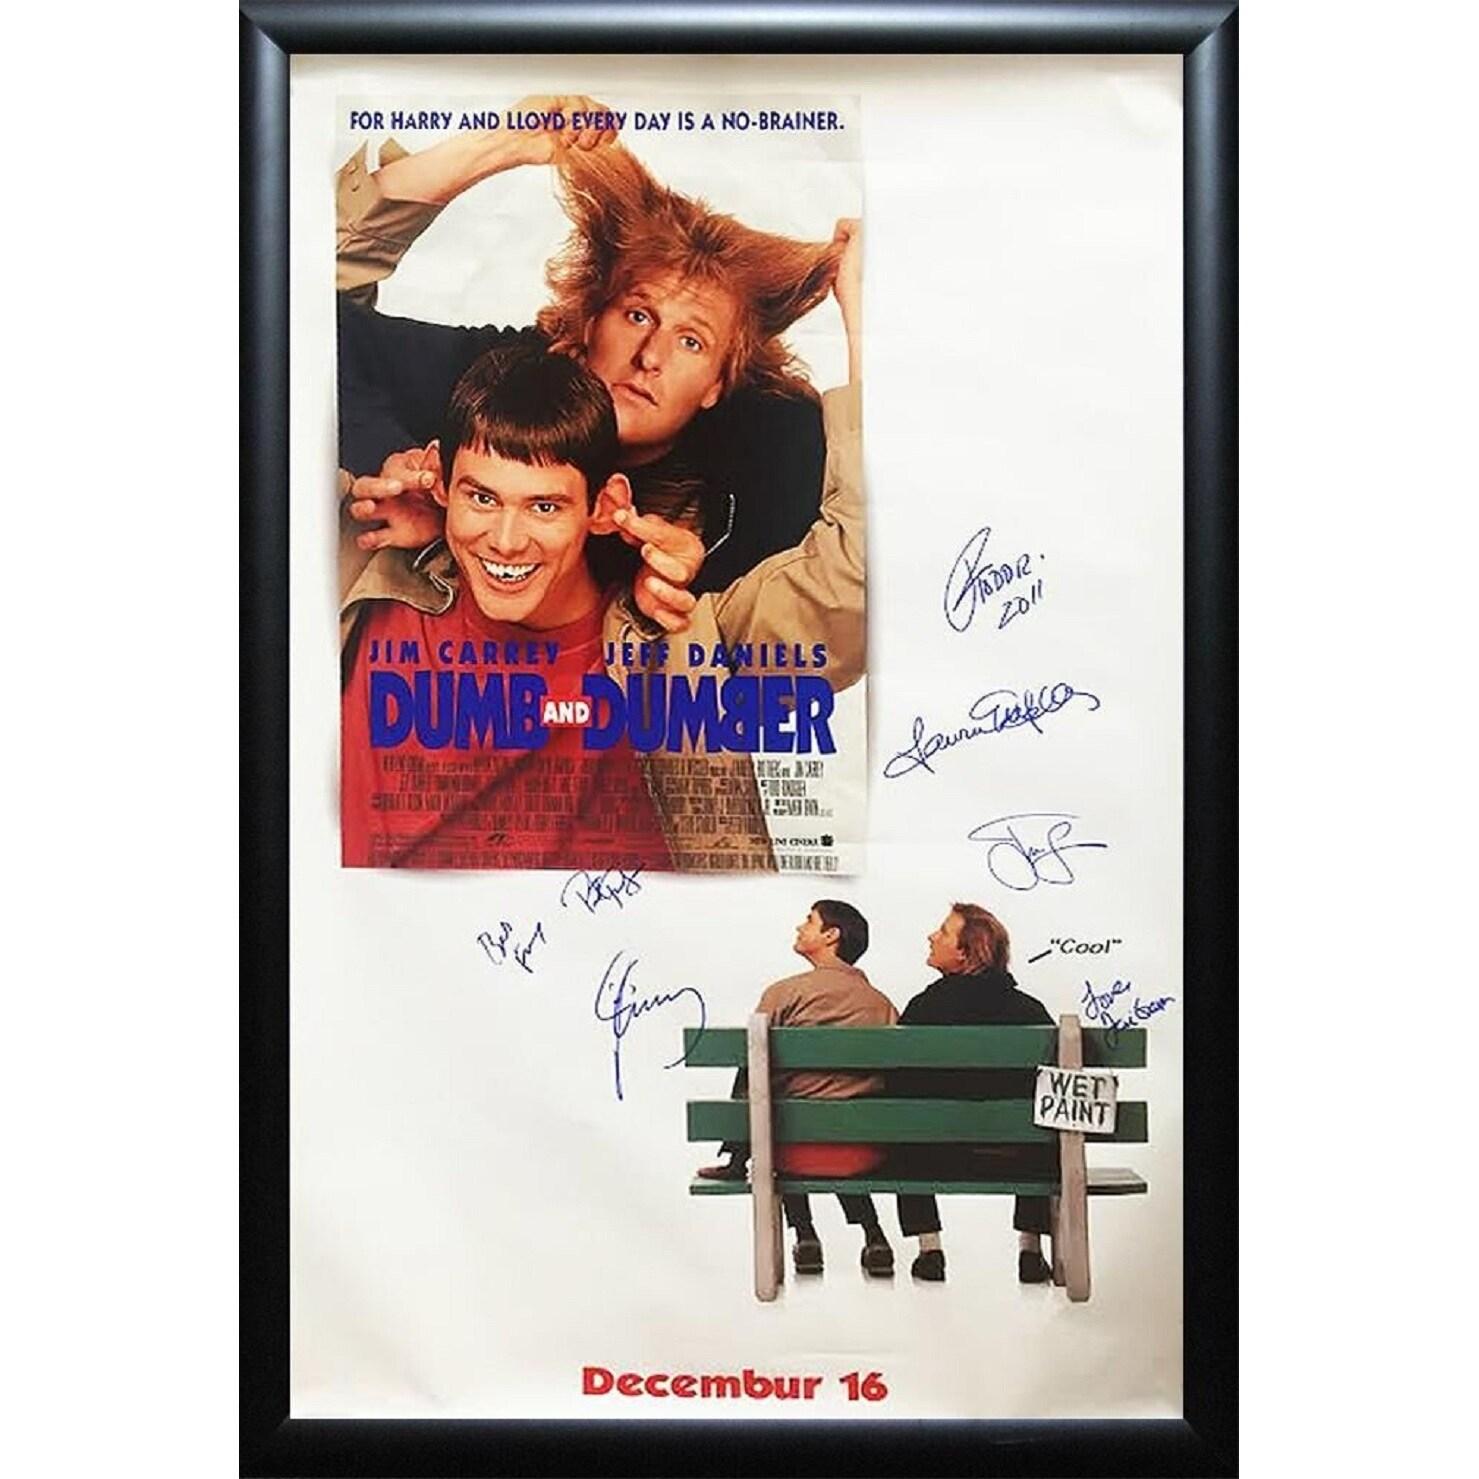 Dumb & Dumber - Signed Movie Poster